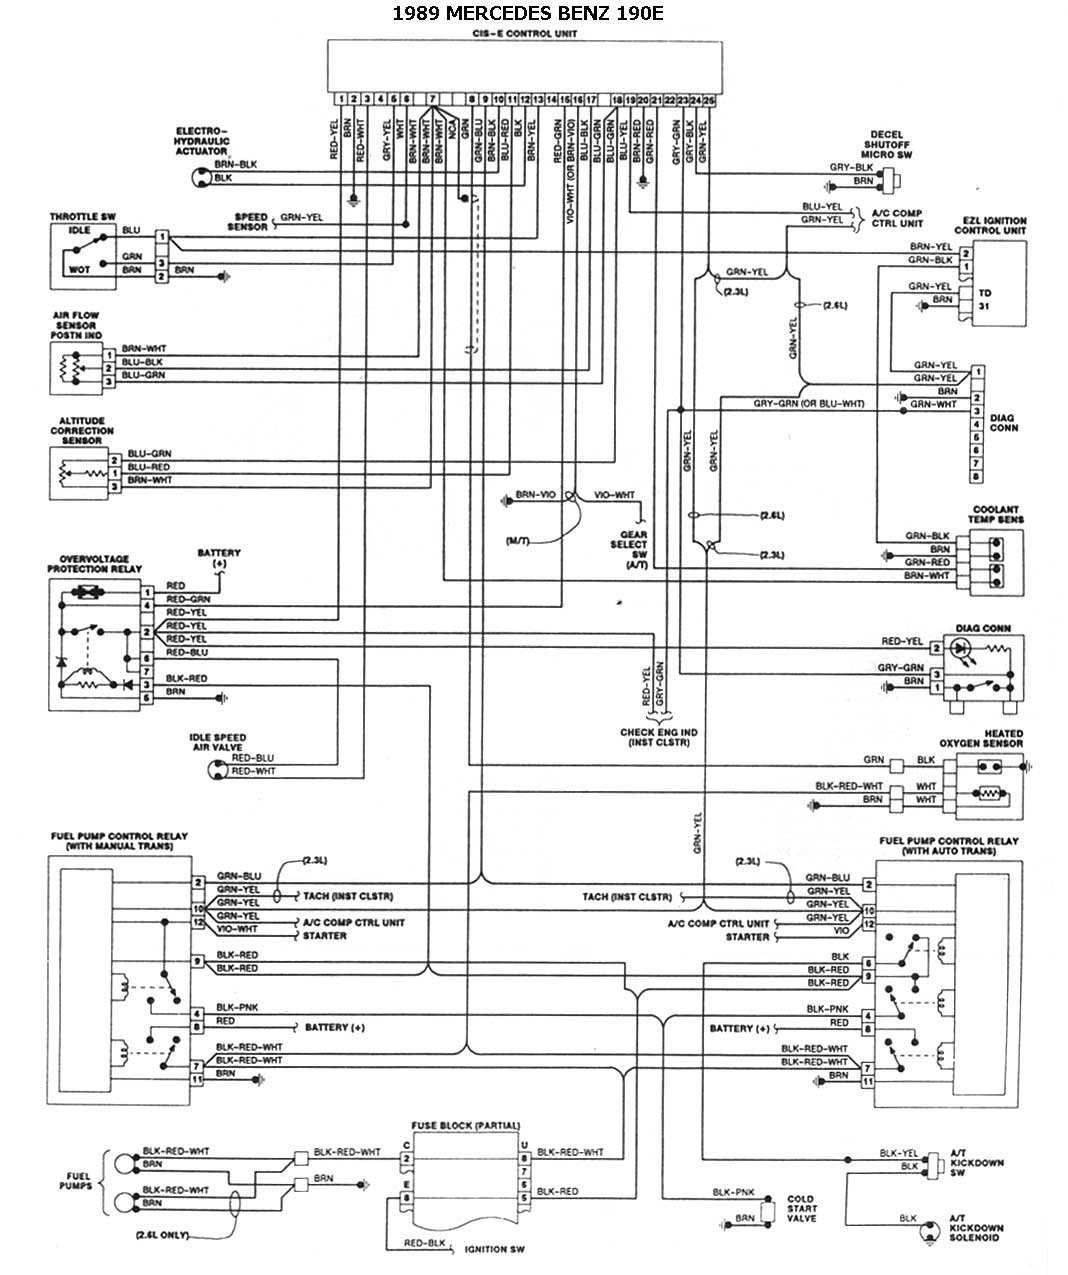 mercedes sprinter wiring diagram massey ferguson 35 attractive mf wire gallery schematics and diagrams 2003 c230 stereo auto